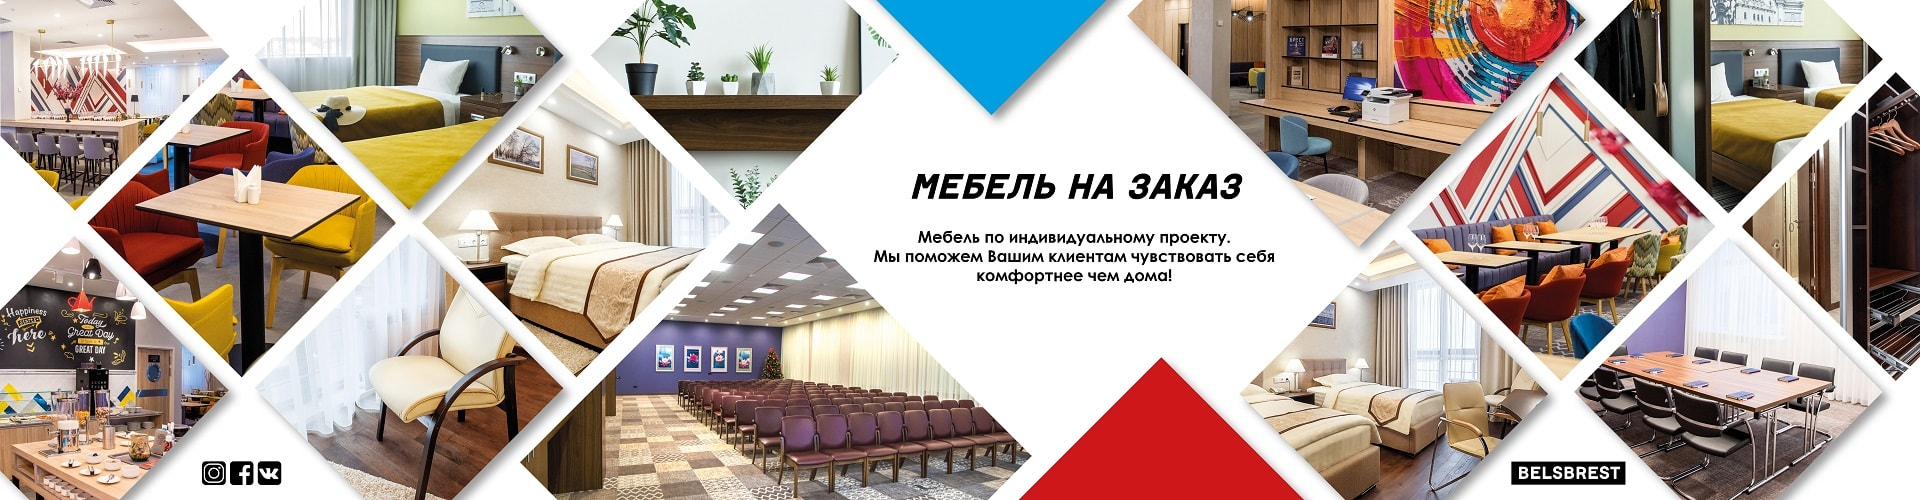 "Мебель ""БЕЛС"" на заказ в Бресте, Минске, РБ баннер на главную"